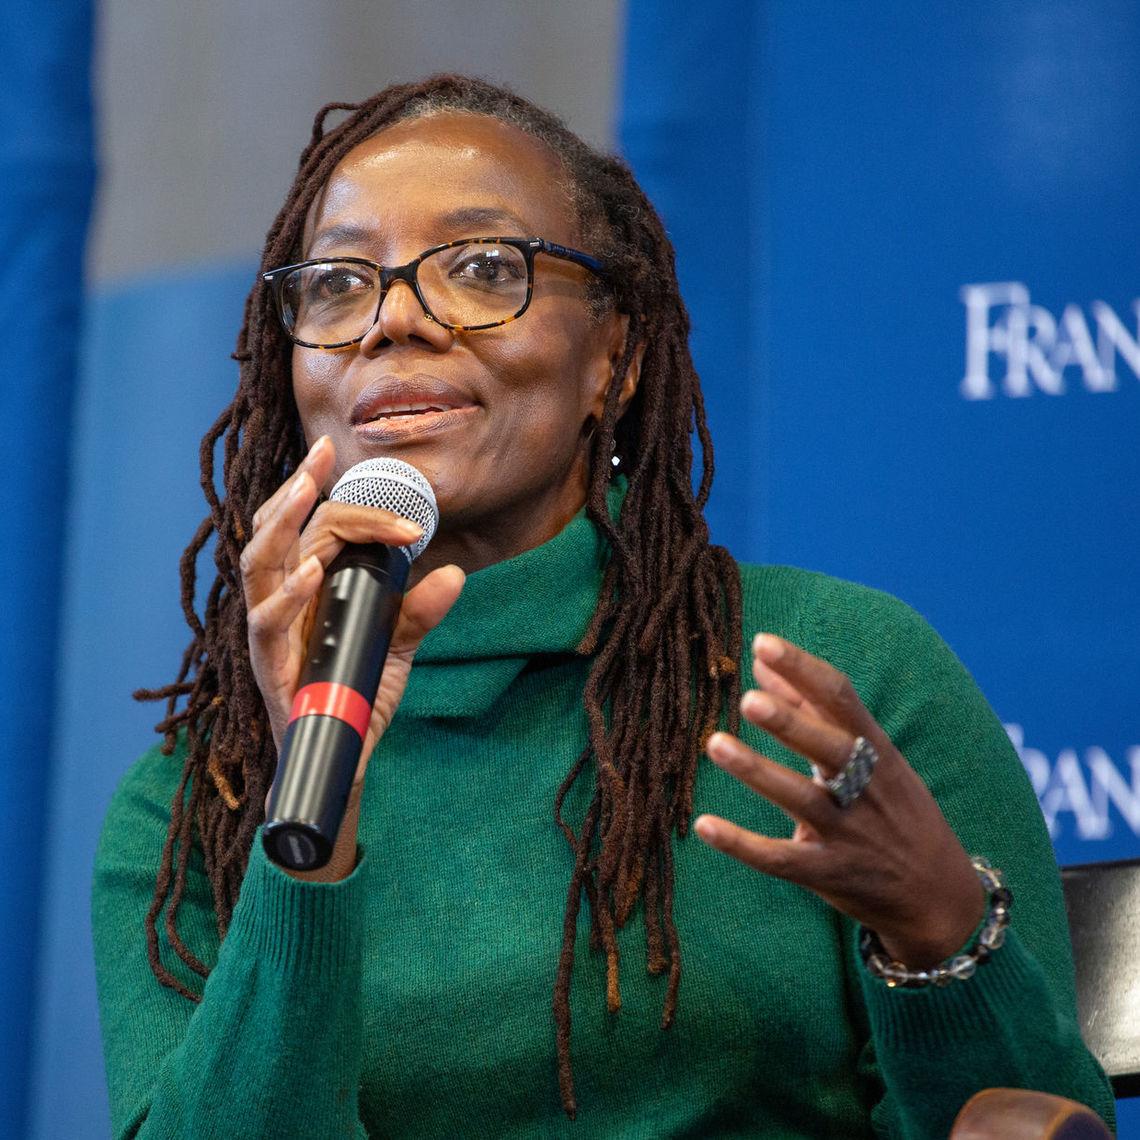 Tsitsi Dangarembga, a Zimbabwean author, filmmaker and activist, speaks at the March 7 Common Hour.